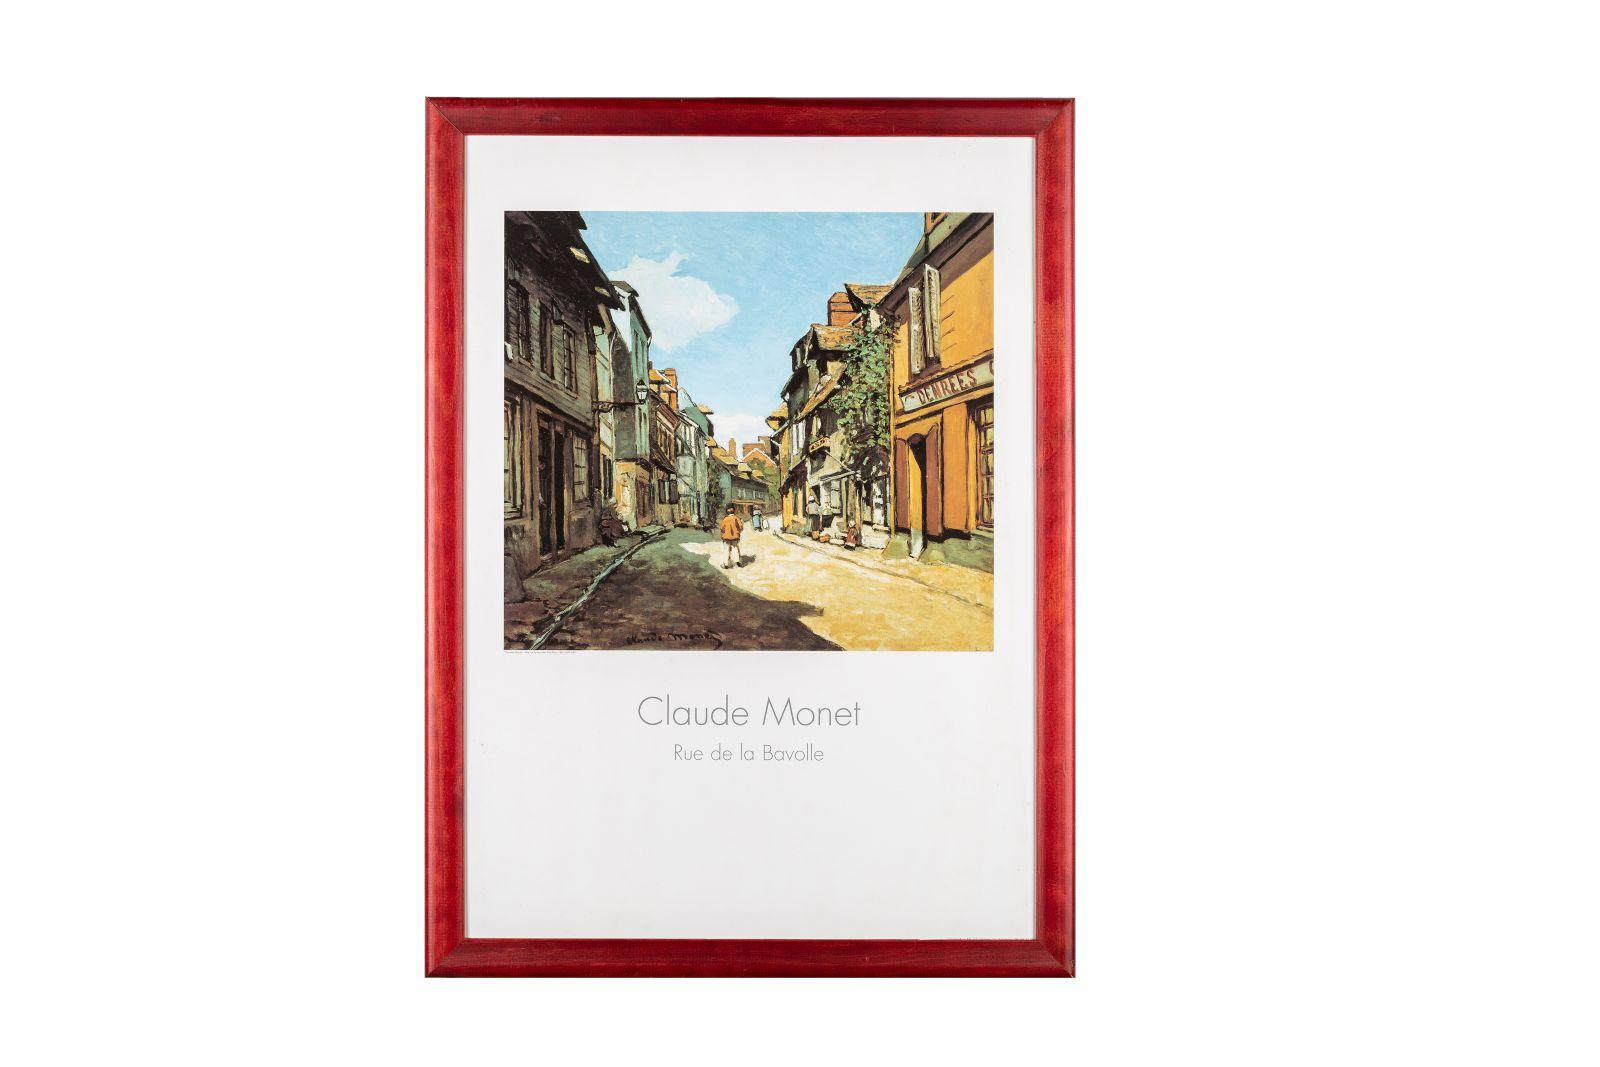 #12 Claude Monet Poster Image